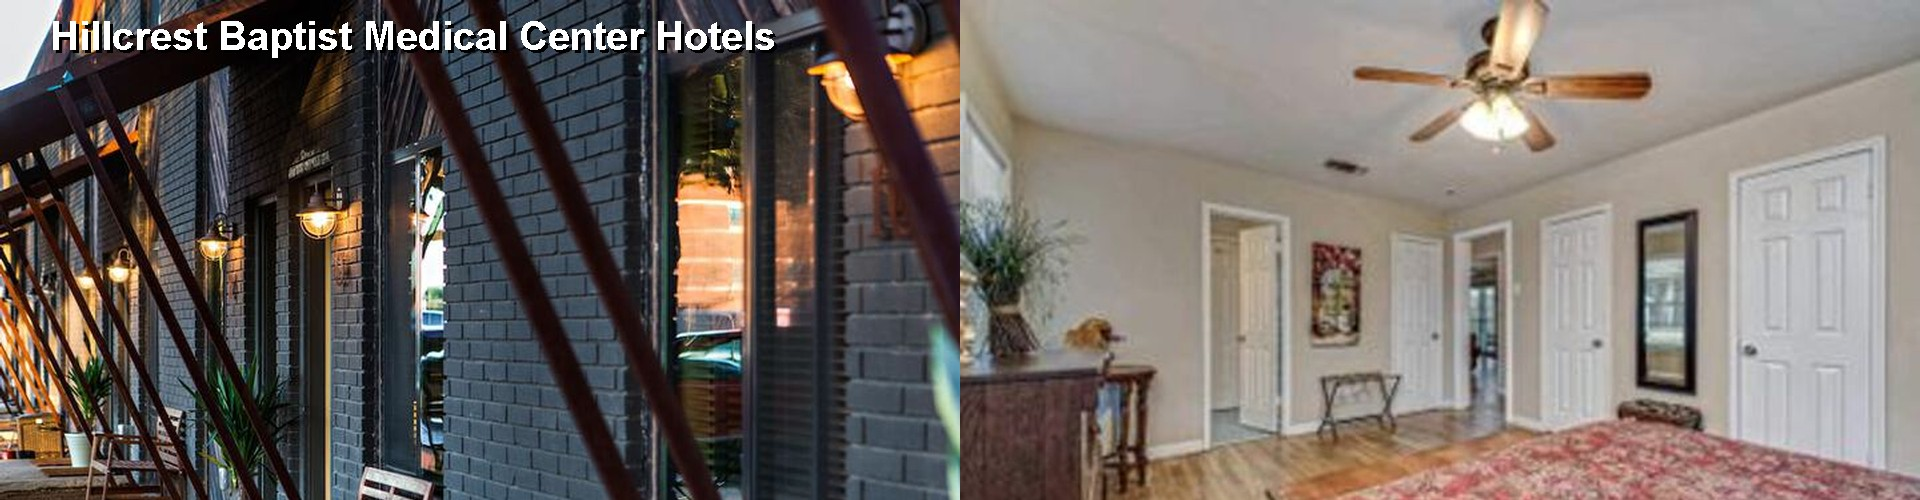 5 Best Hotels Near Hillcrest Baptist Medical Center